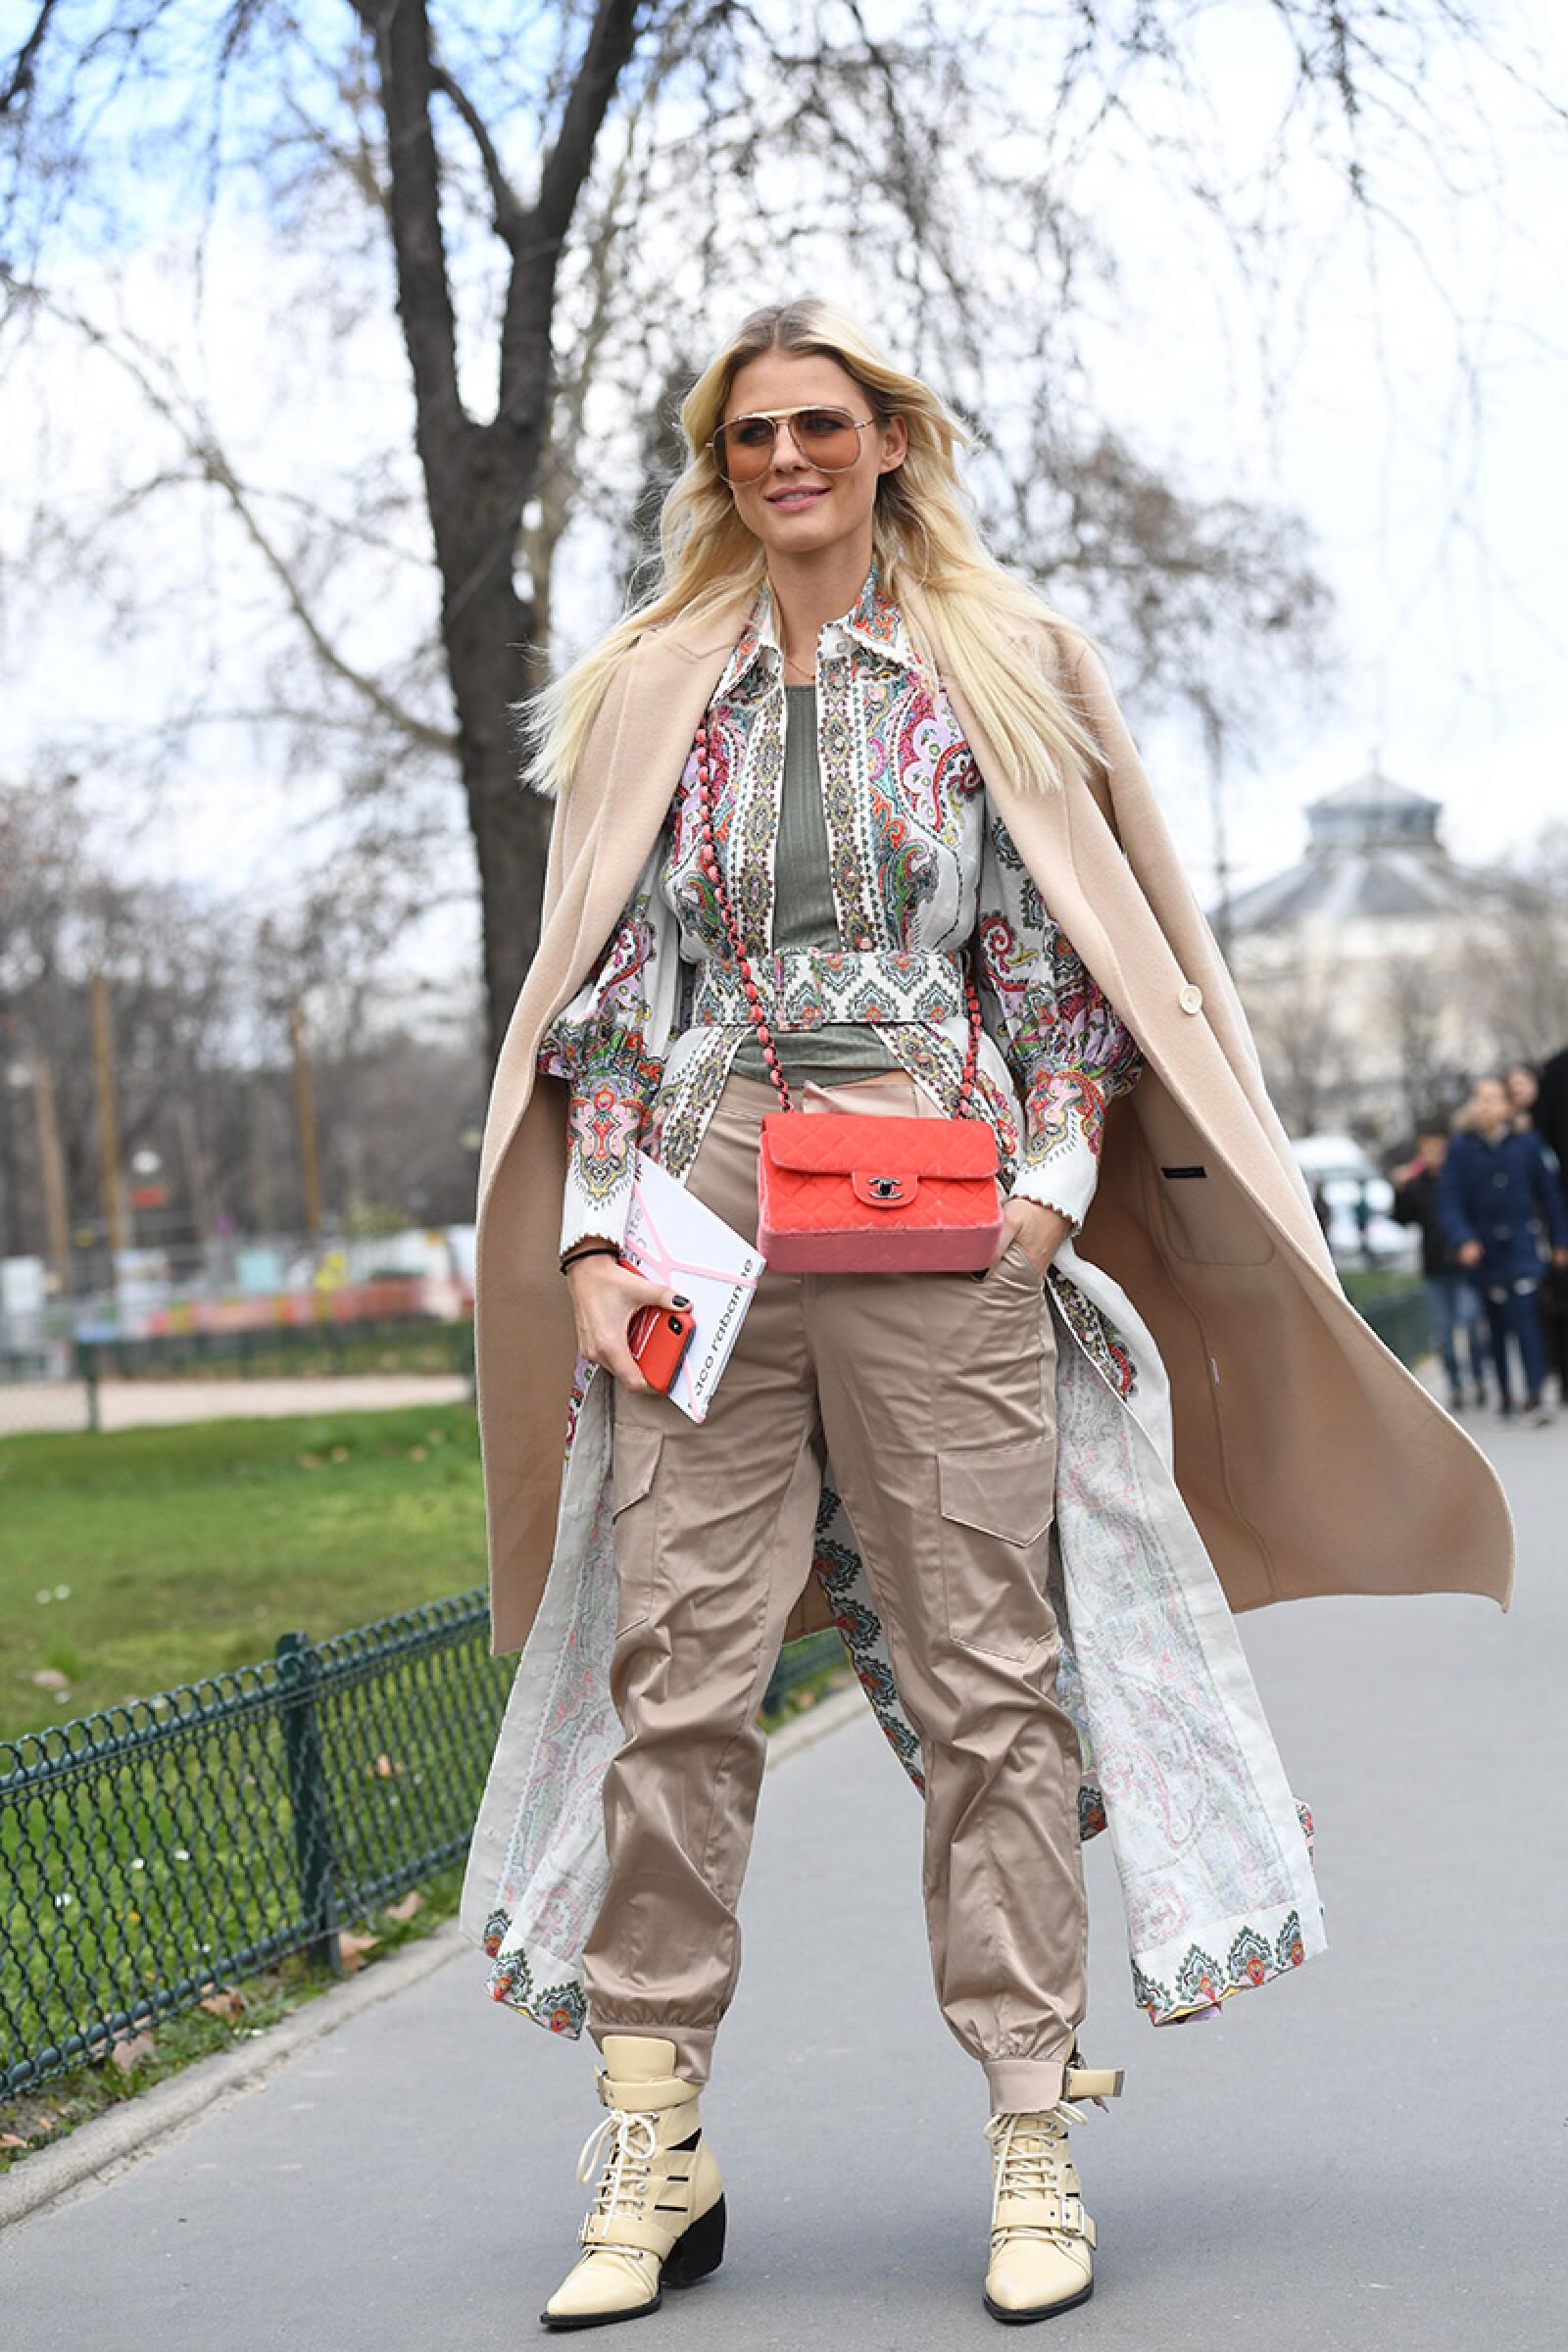 Street style, Fall Winter 2019, Paris Fashion Week, France - 28 Feb 2019